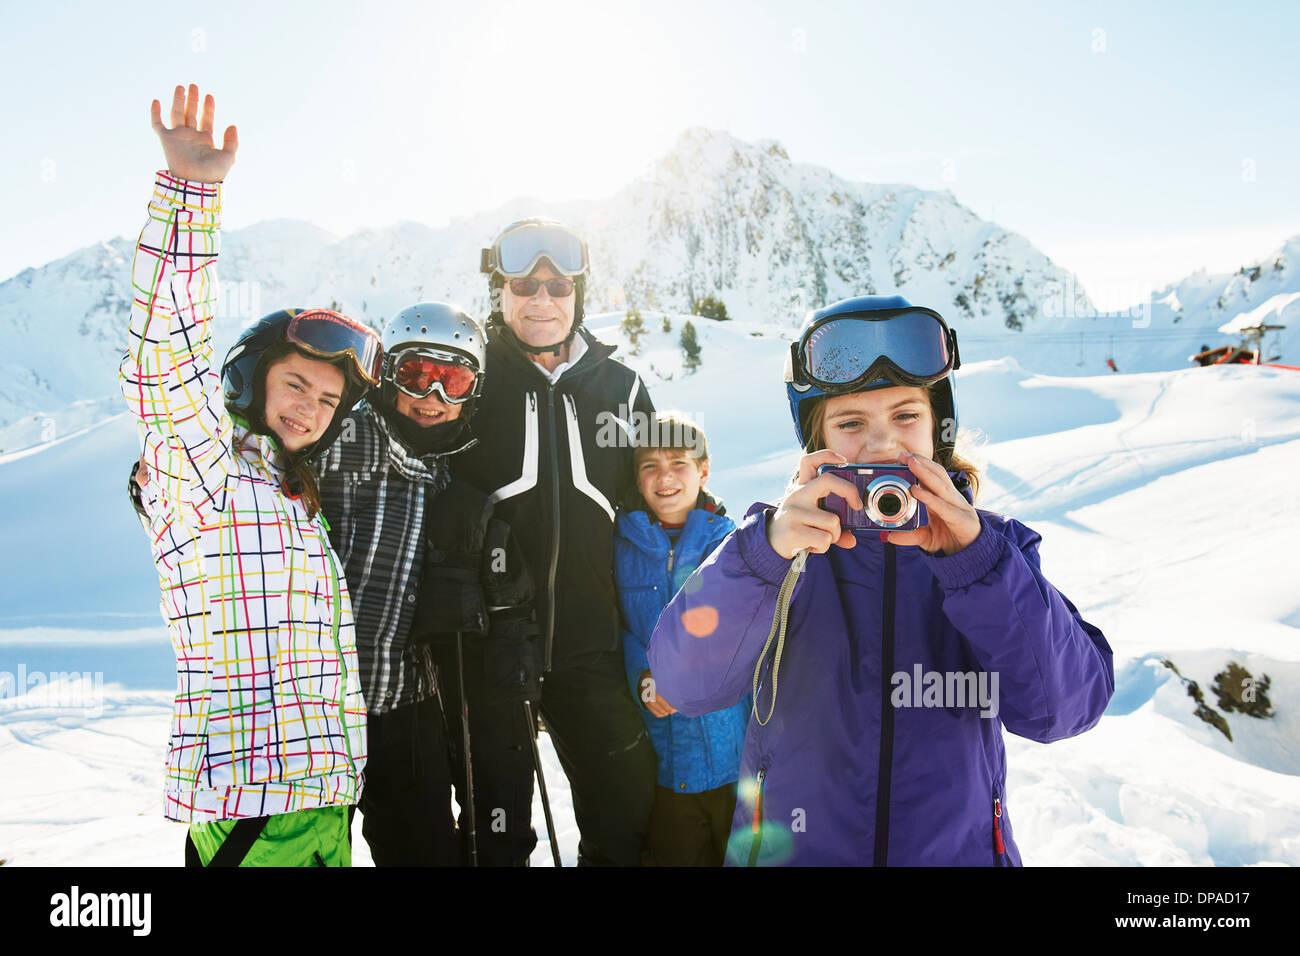 Portrait of skiing family, Les Arcs, Haute-Savoie, France - Stock Image